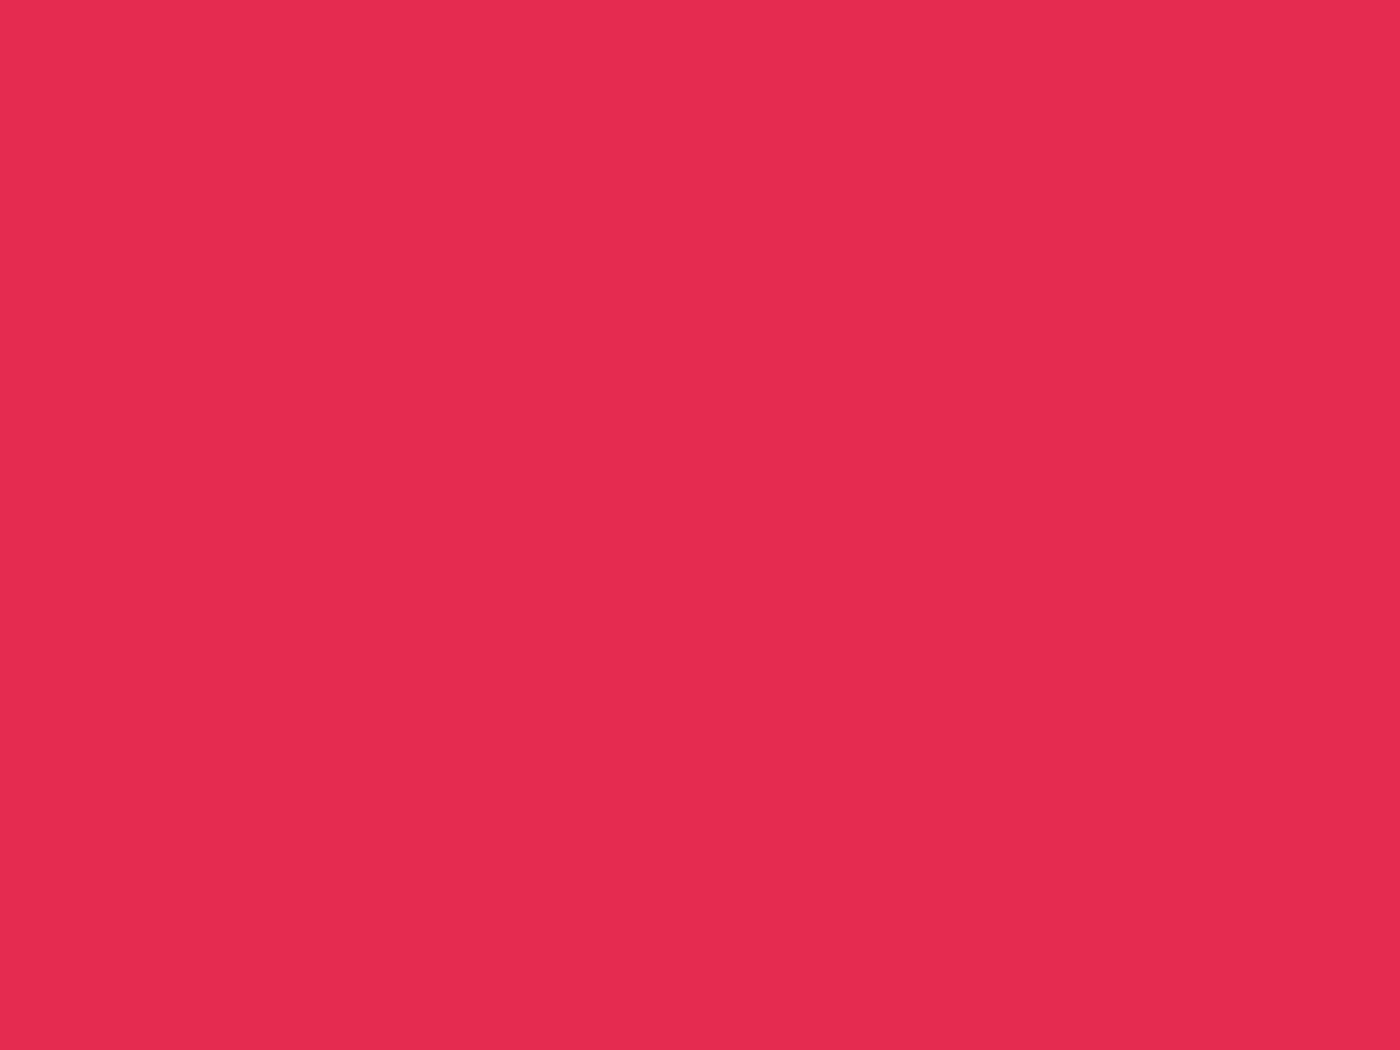 1400x1050 Amaranth Solid Color Background